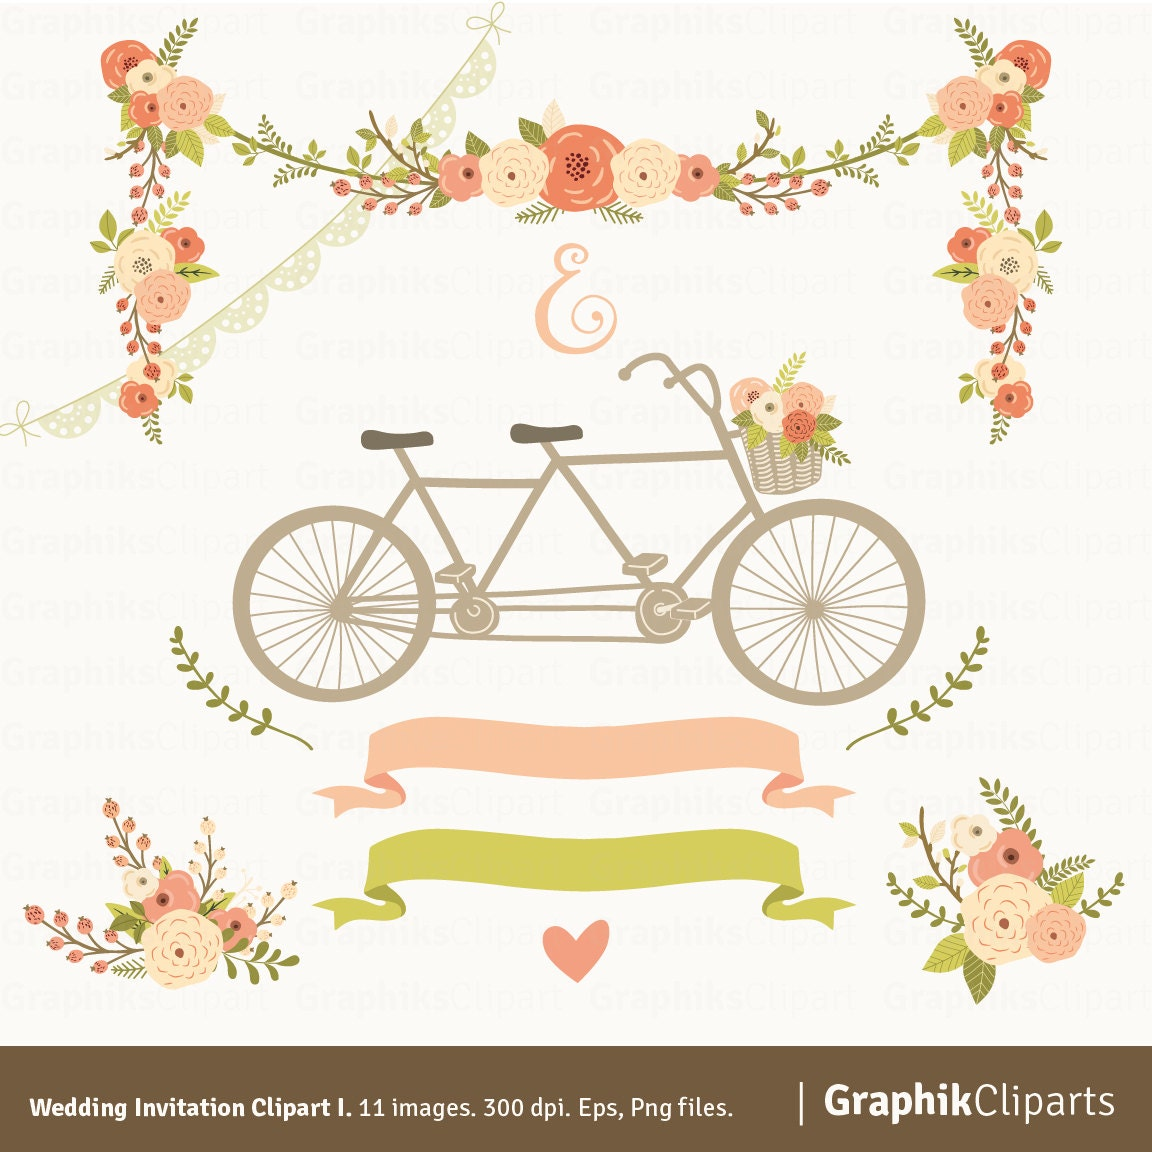 Wedding Invitation Clipart I. Floral Garland Tandem Flowers